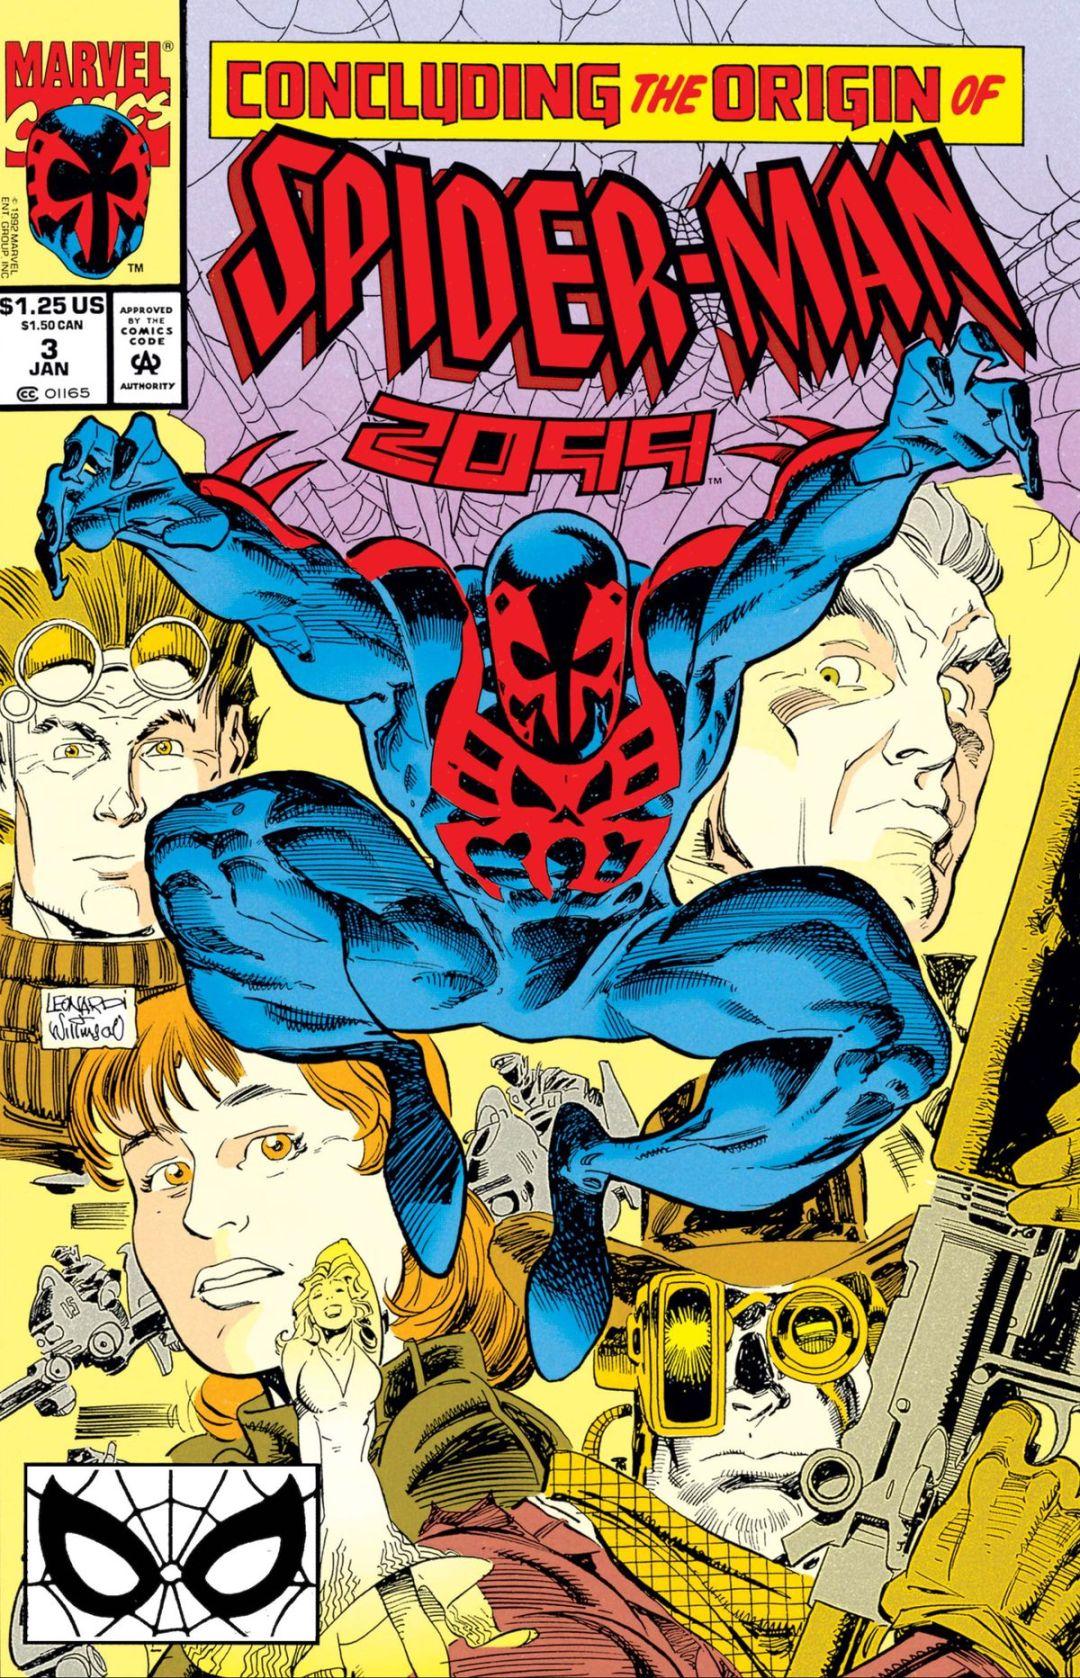 Spider-Man 2099 #3, Marvel Comics (2018).